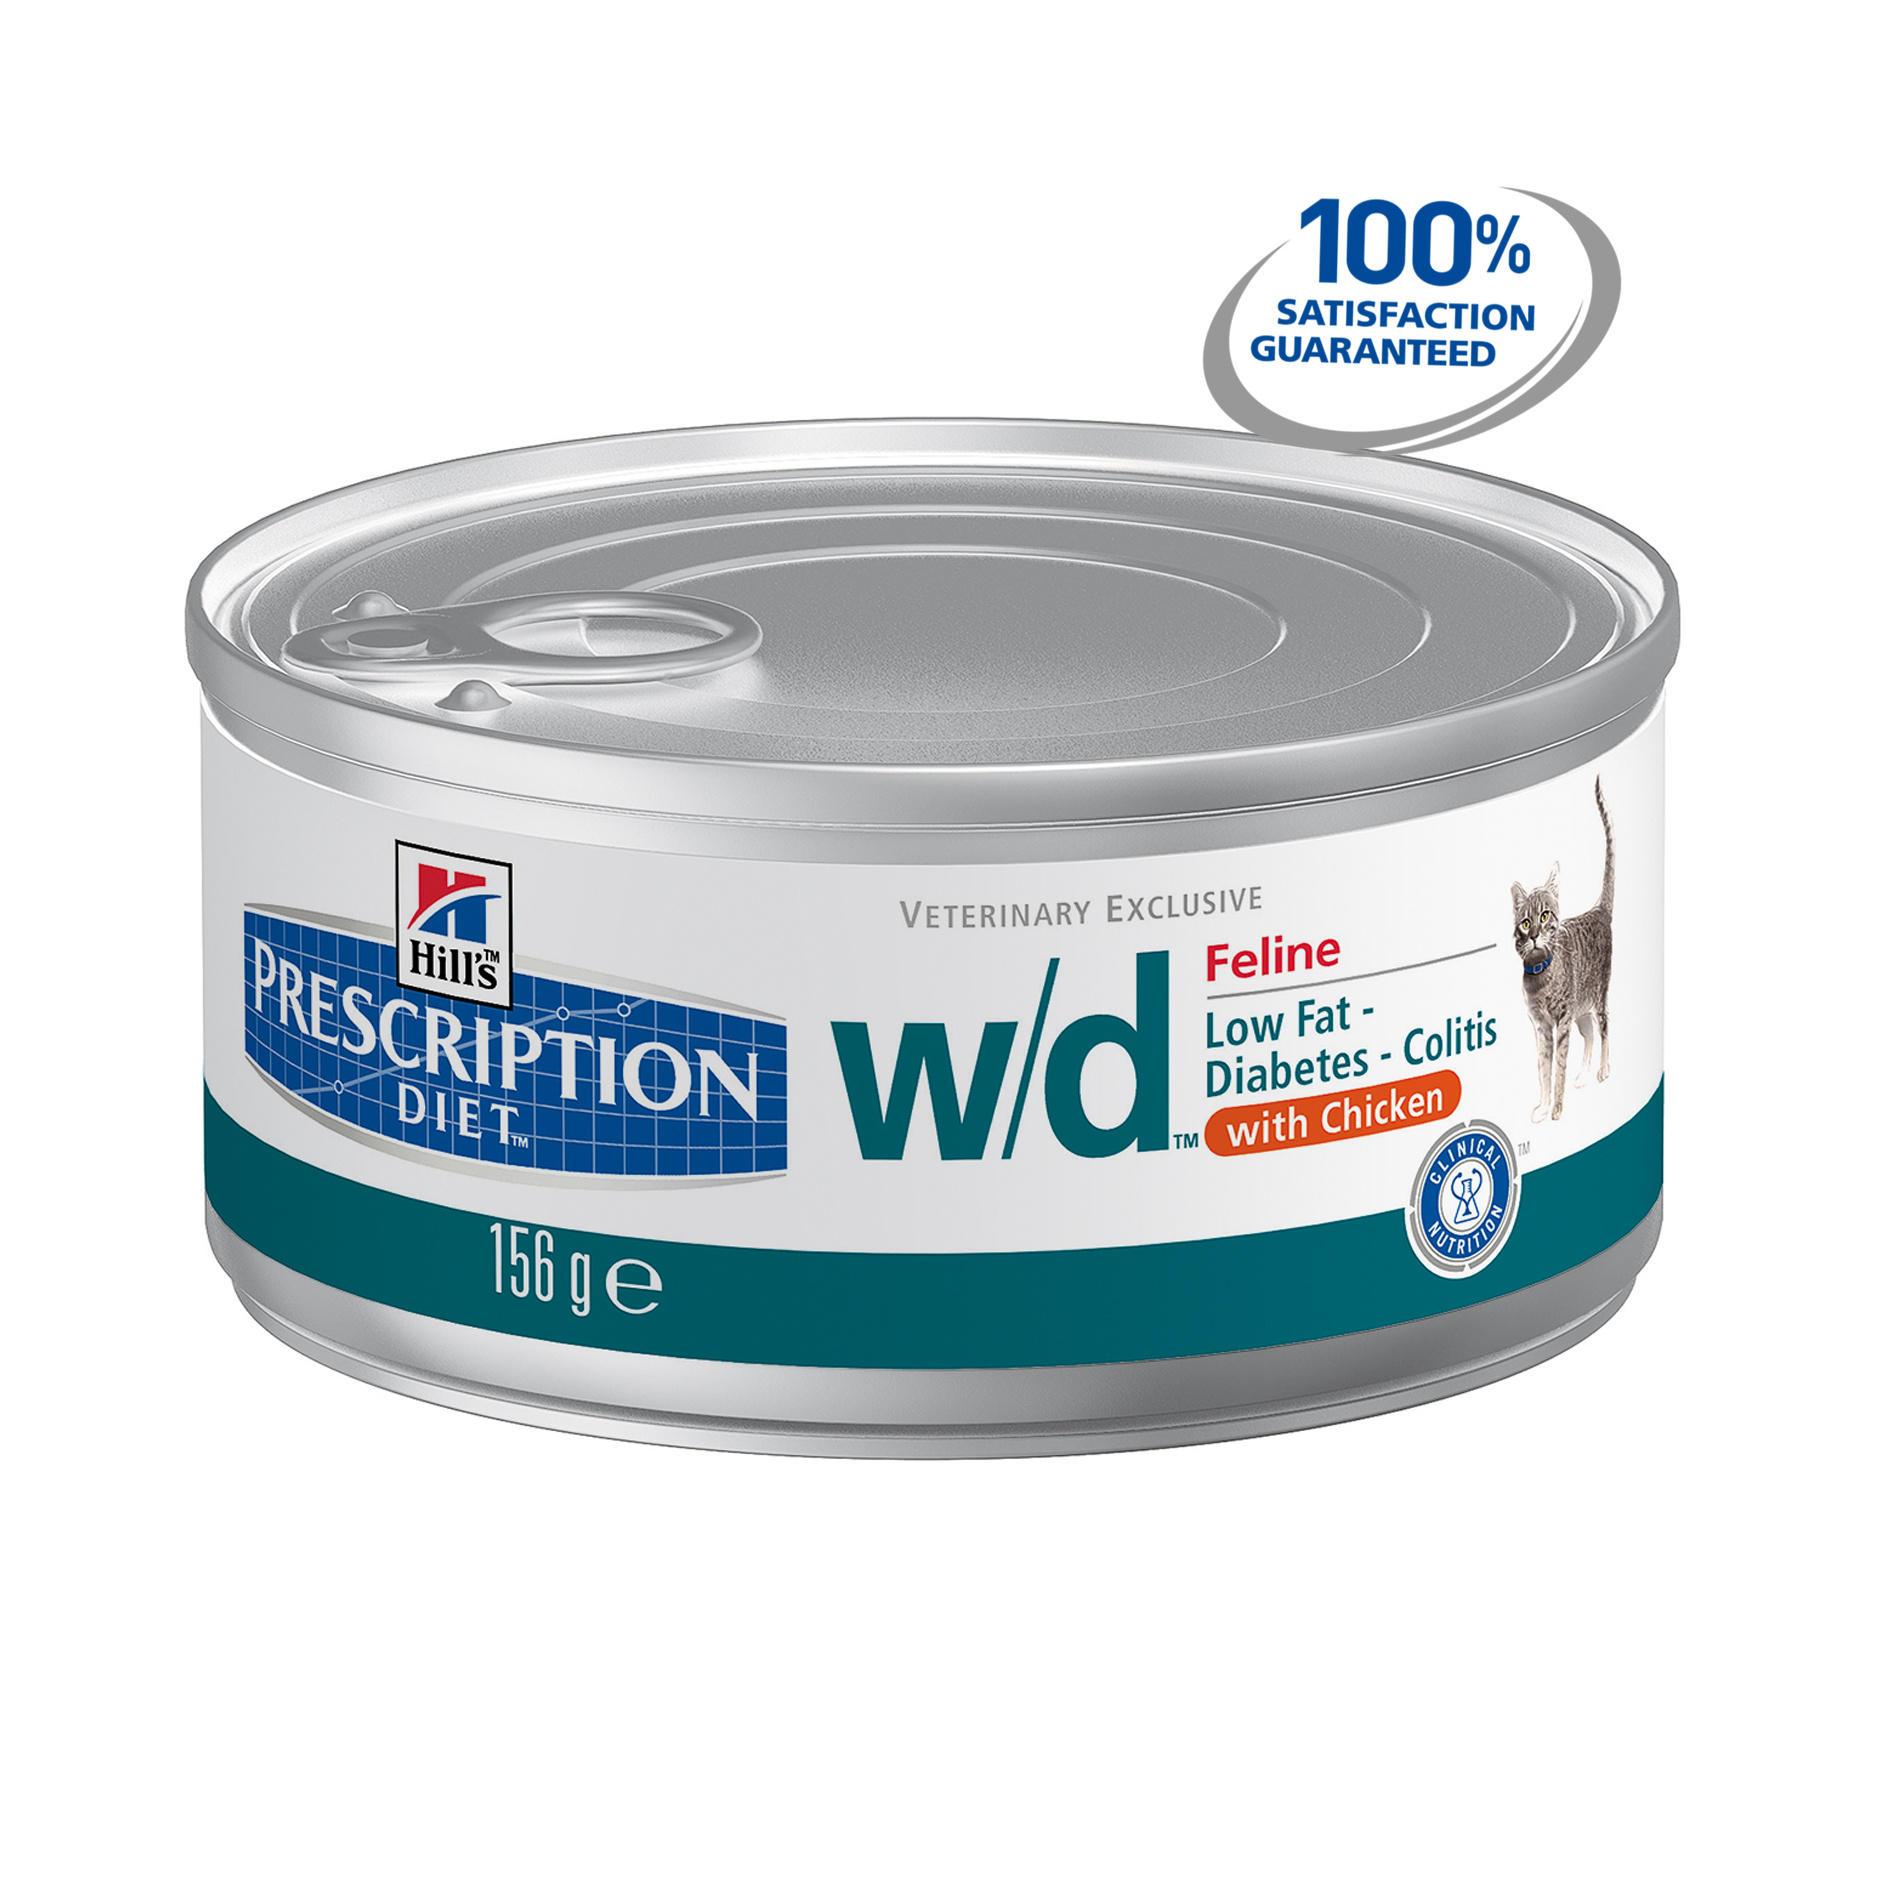 Hills Prescription Diet Wd Cat Food Prices